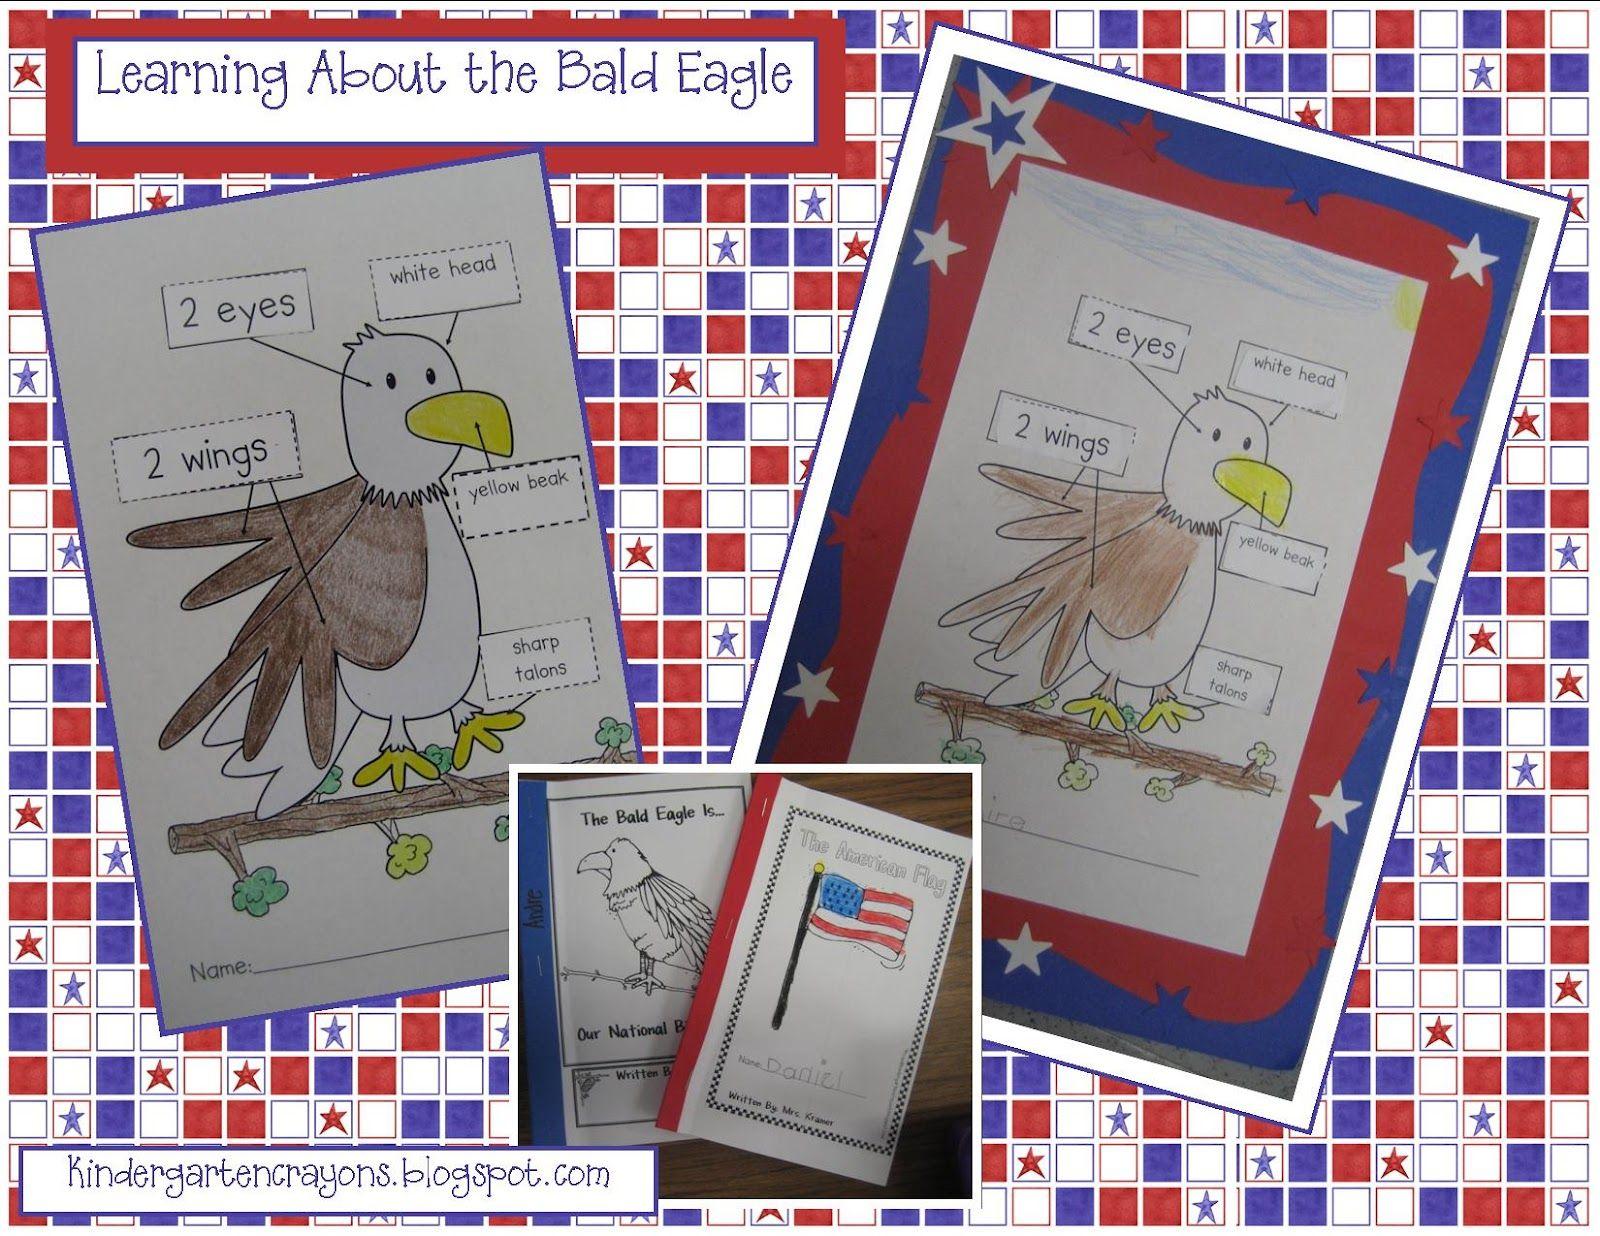 Kindergarten Crayons Bald Eagle